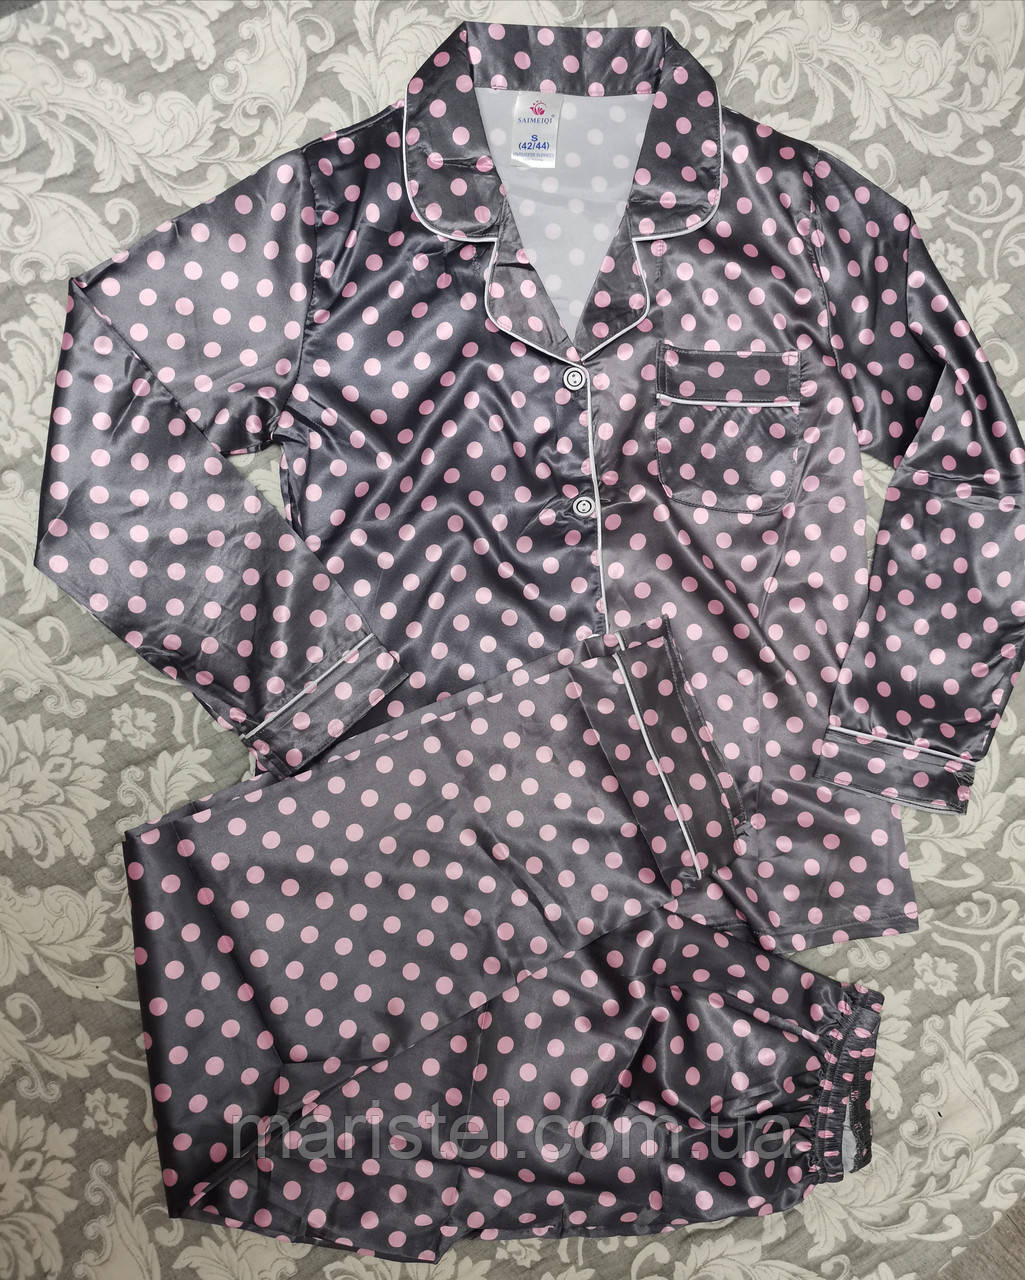 Женская пижама атлас 36-3